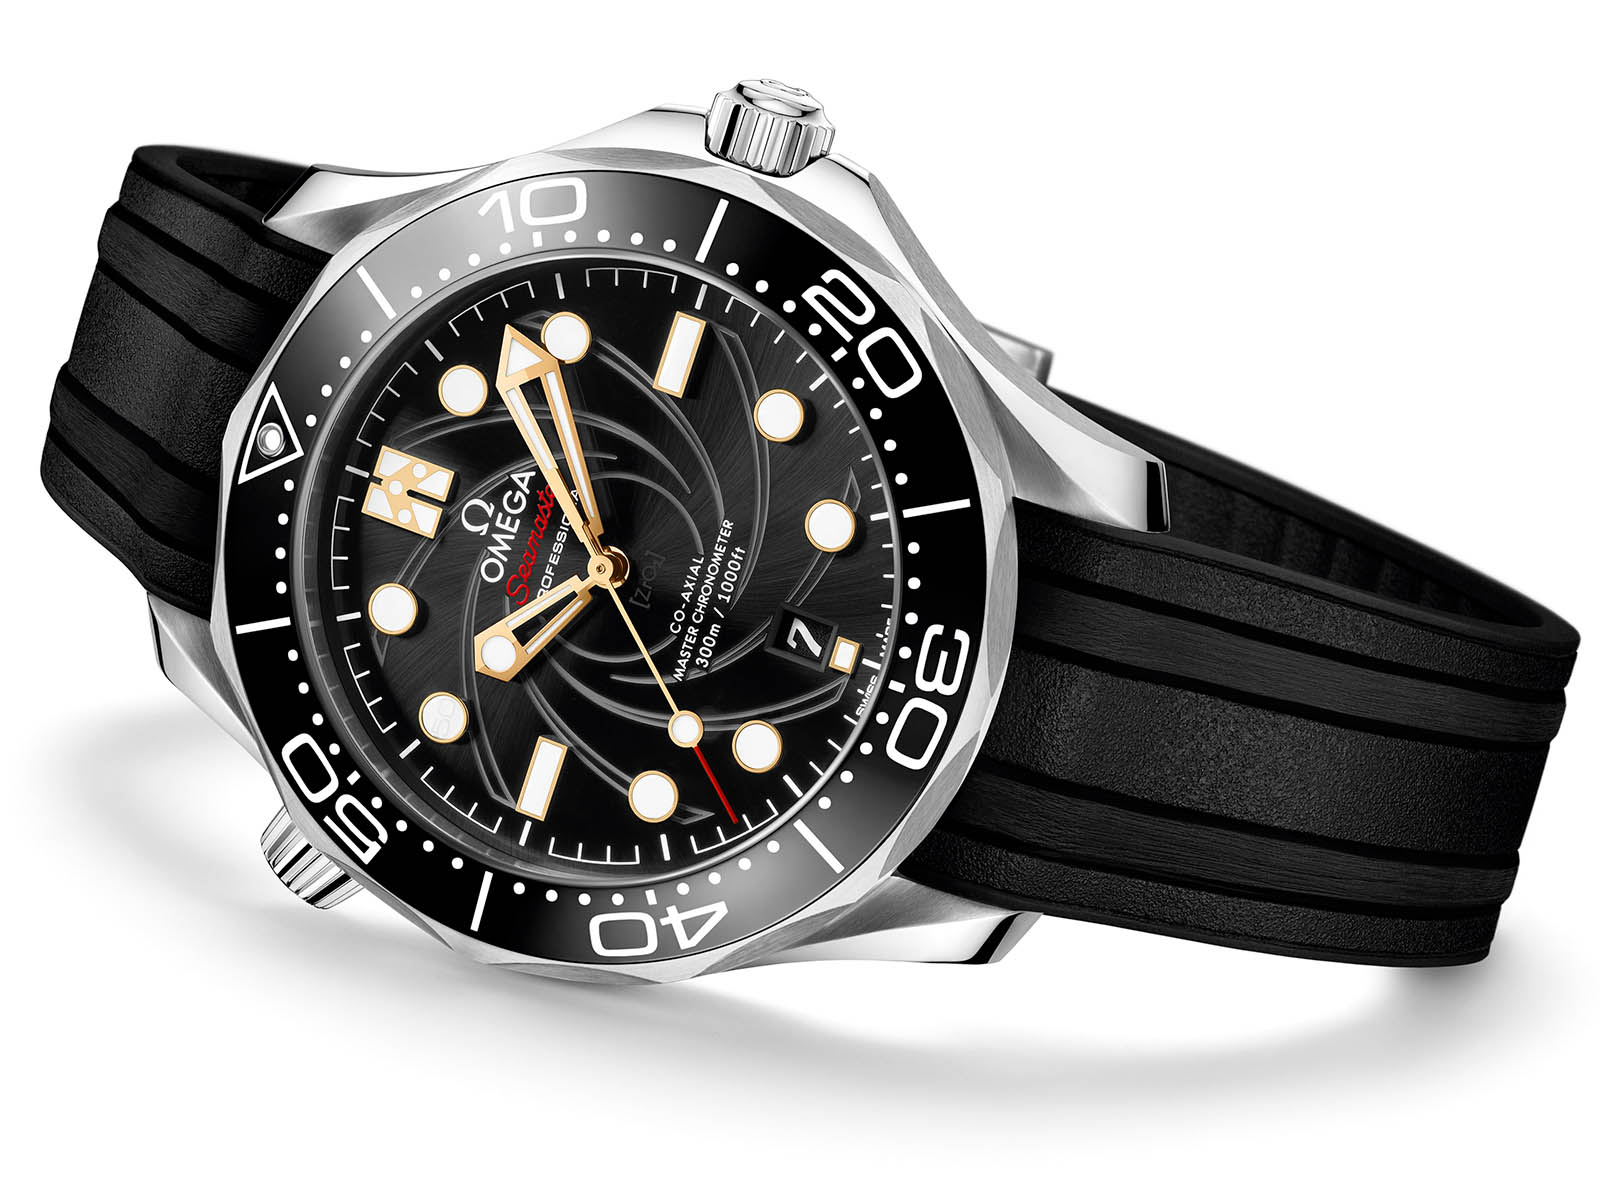 210-22-42-20-01-004-omega-seamaster-300m-diver-007-3-.jpg